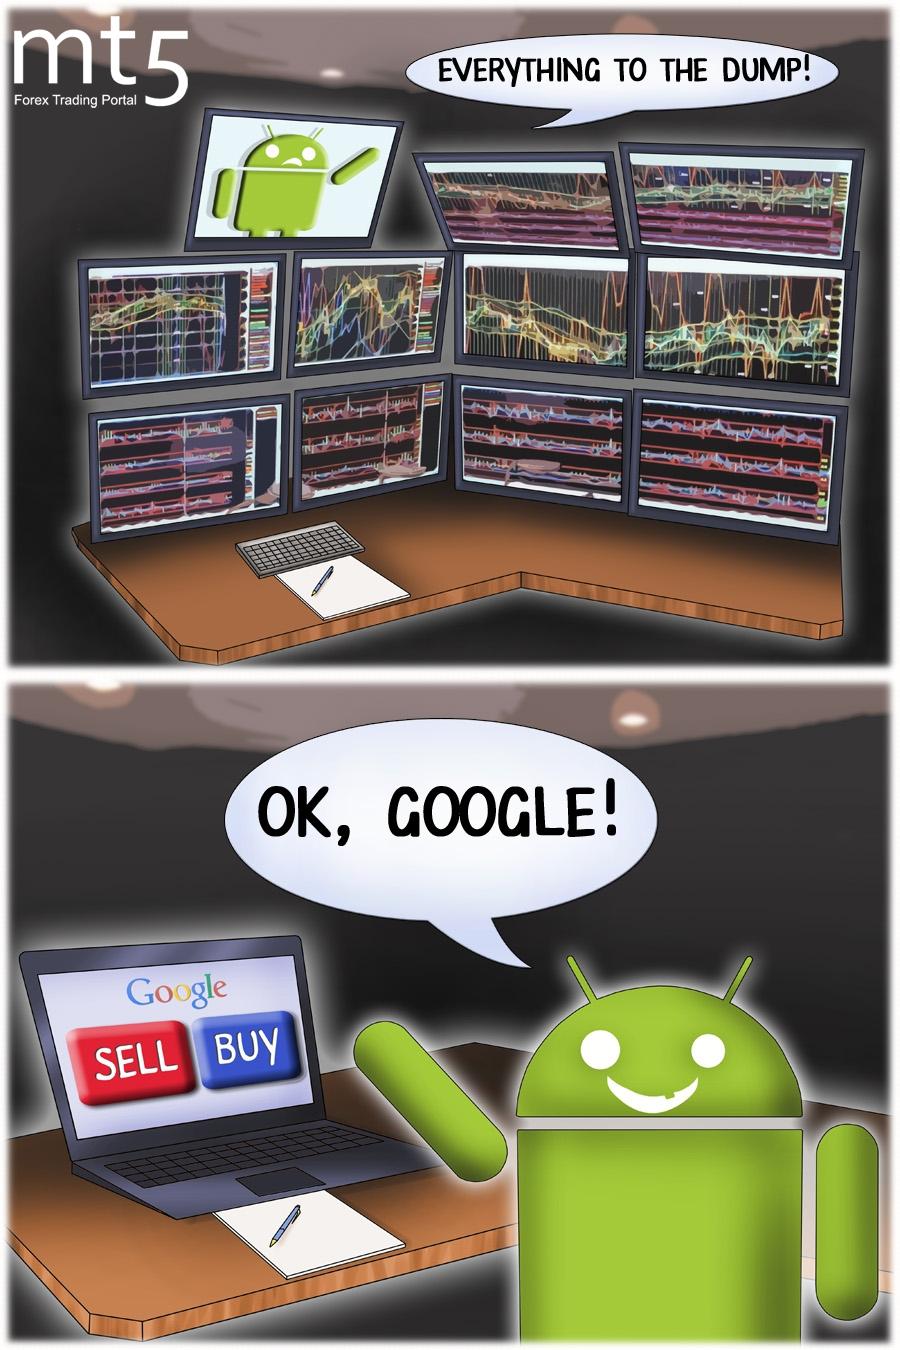 Google to help traders analyze financial markets